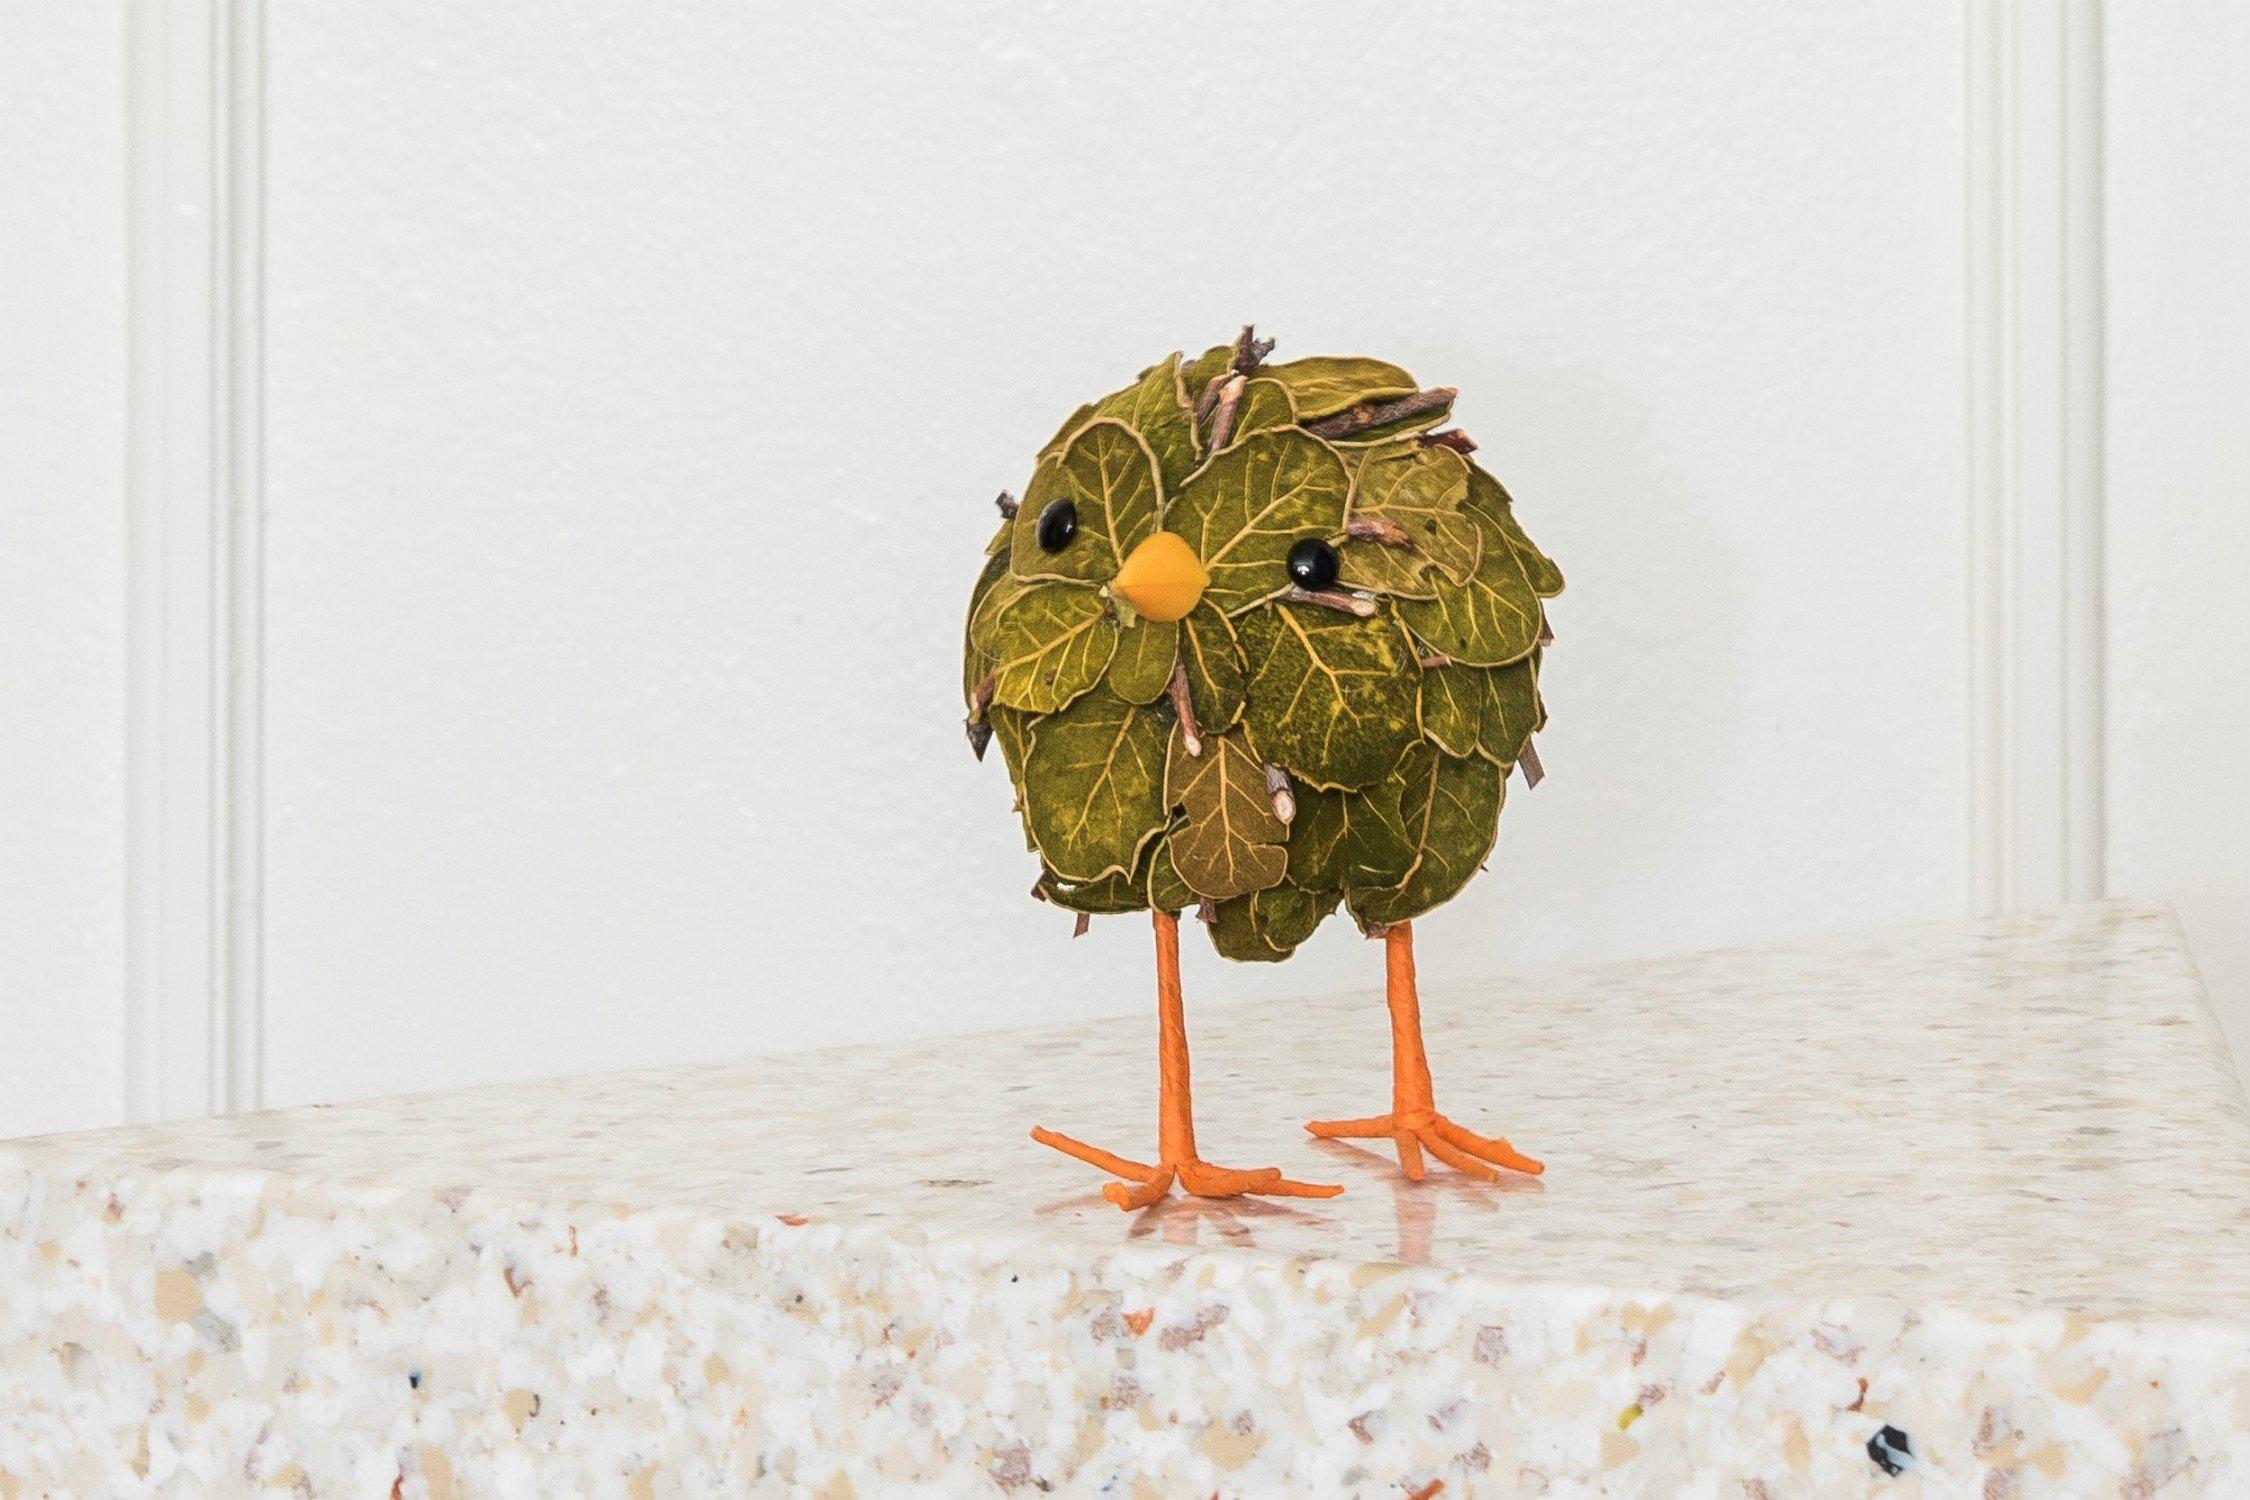 Green Leaf Chick (10 cm)